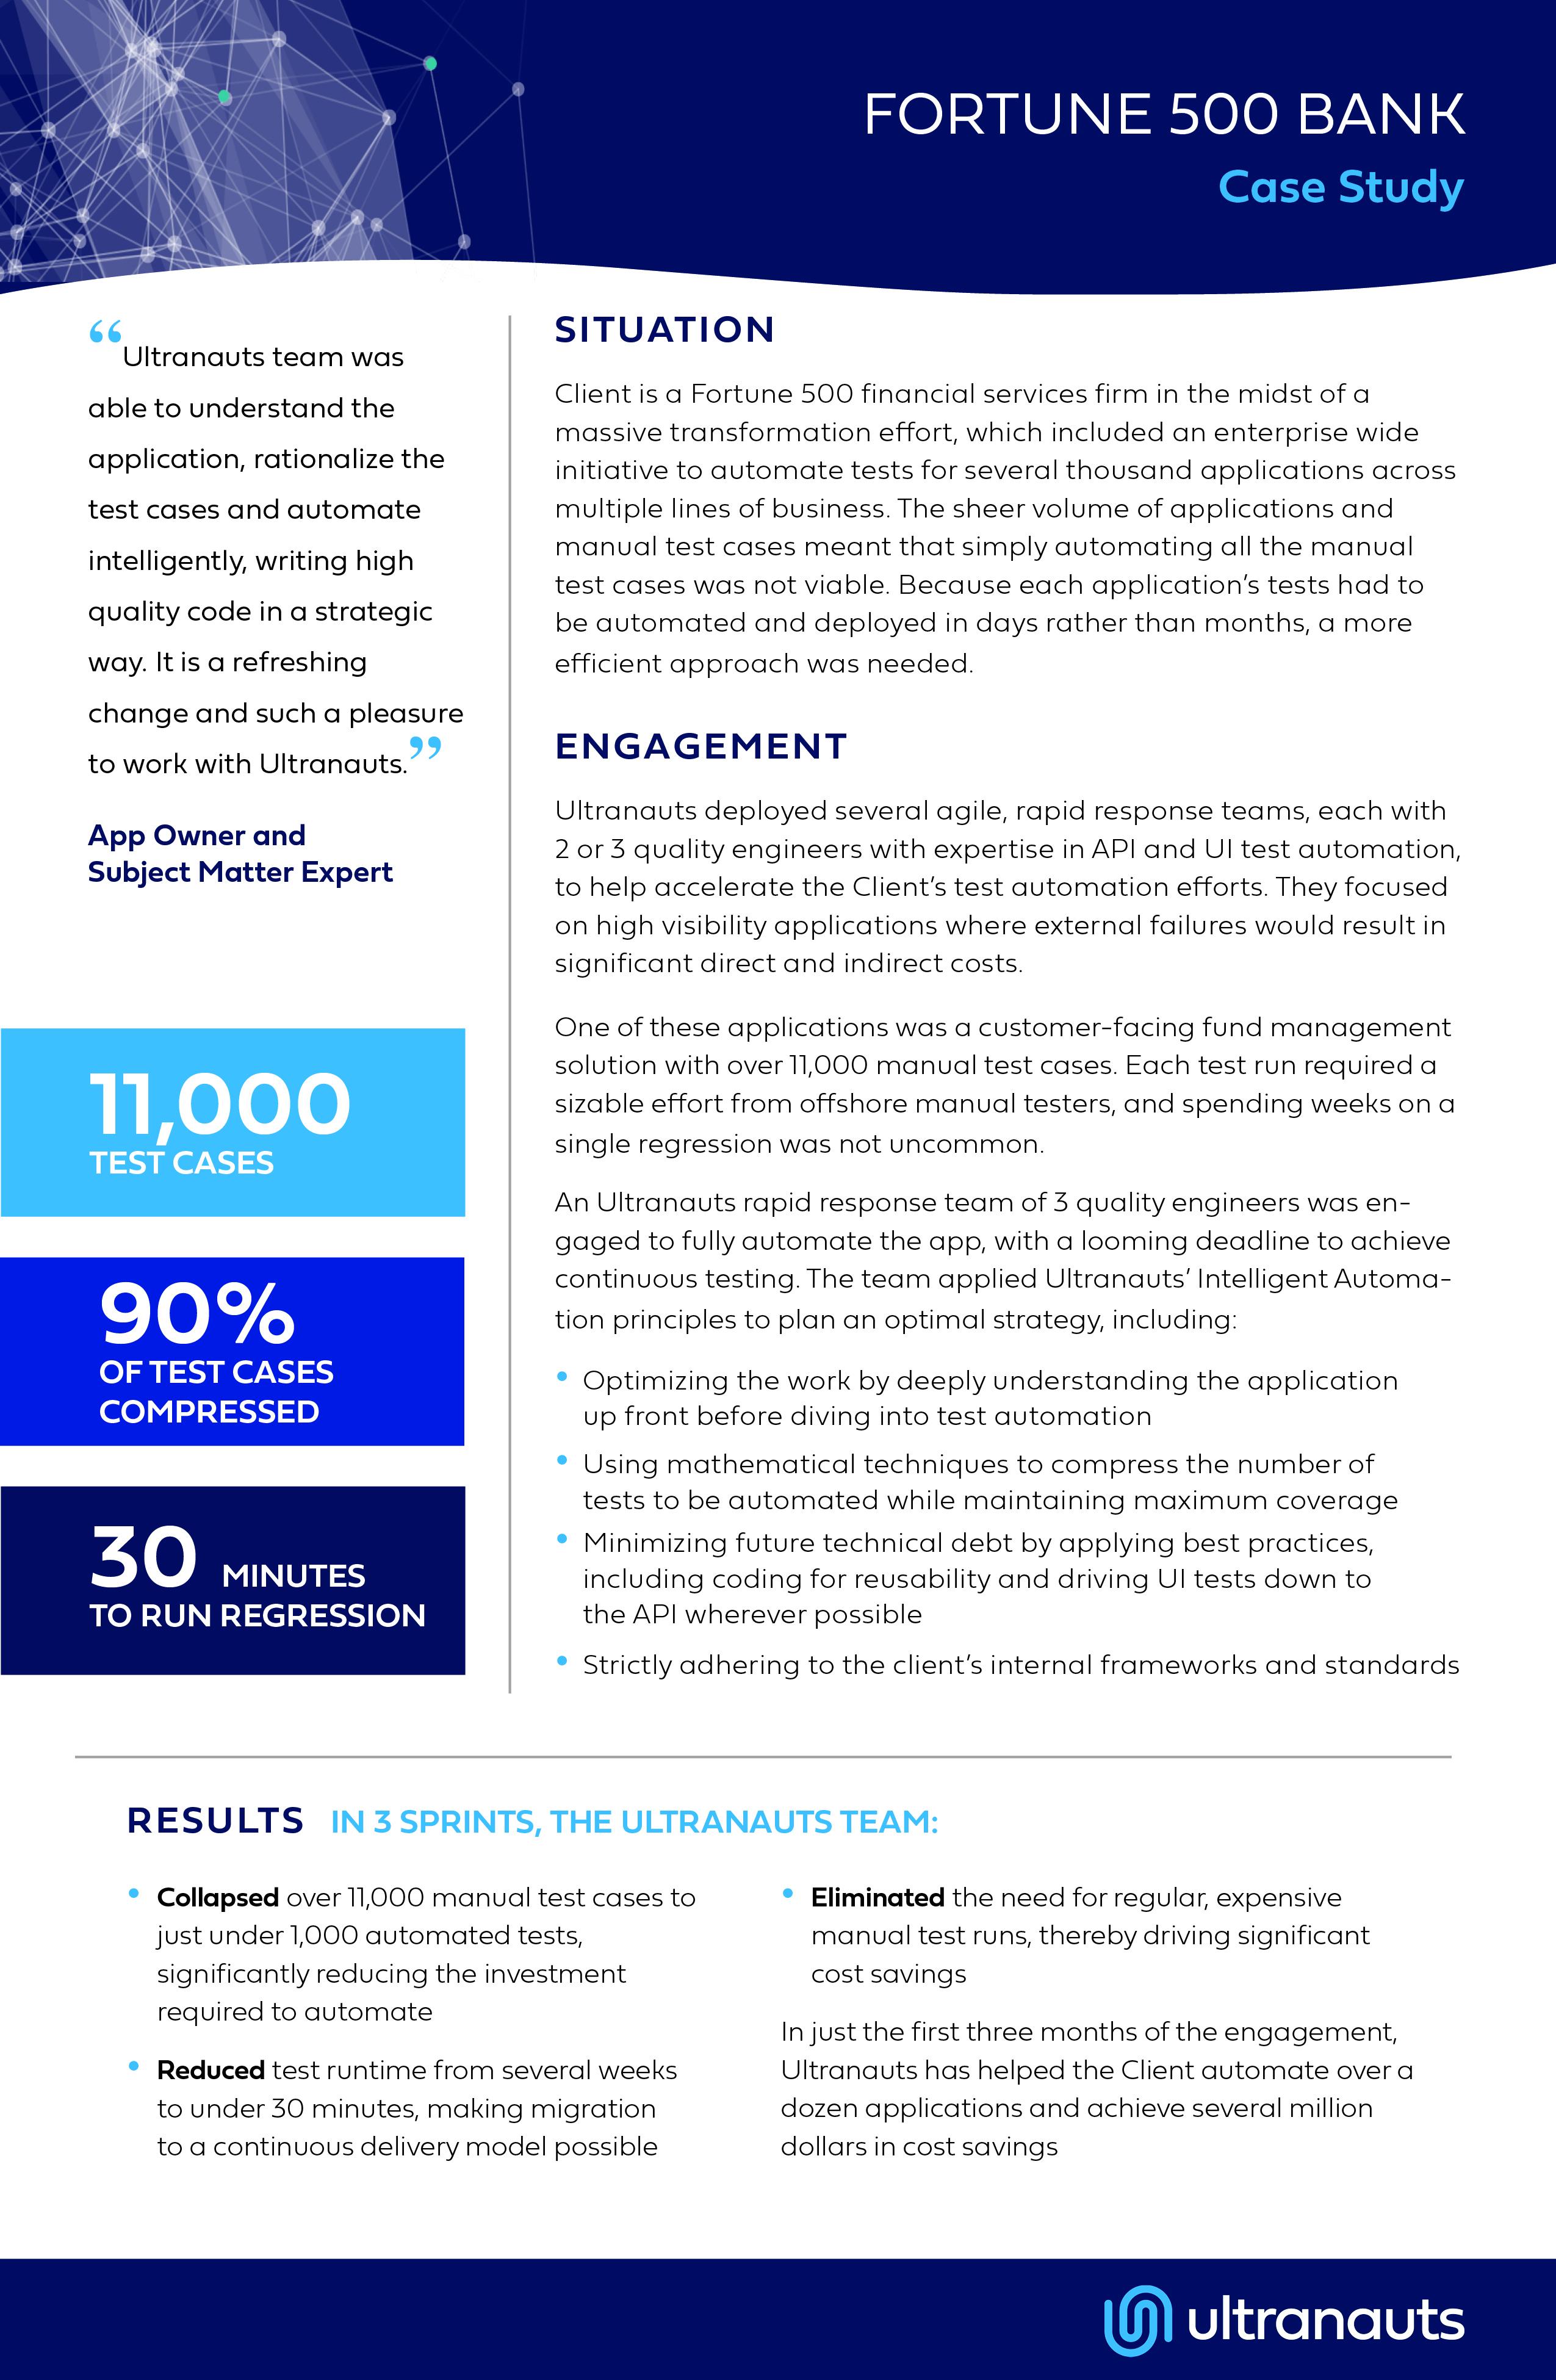 Ultranauts - Fortune 500 Bank Case study